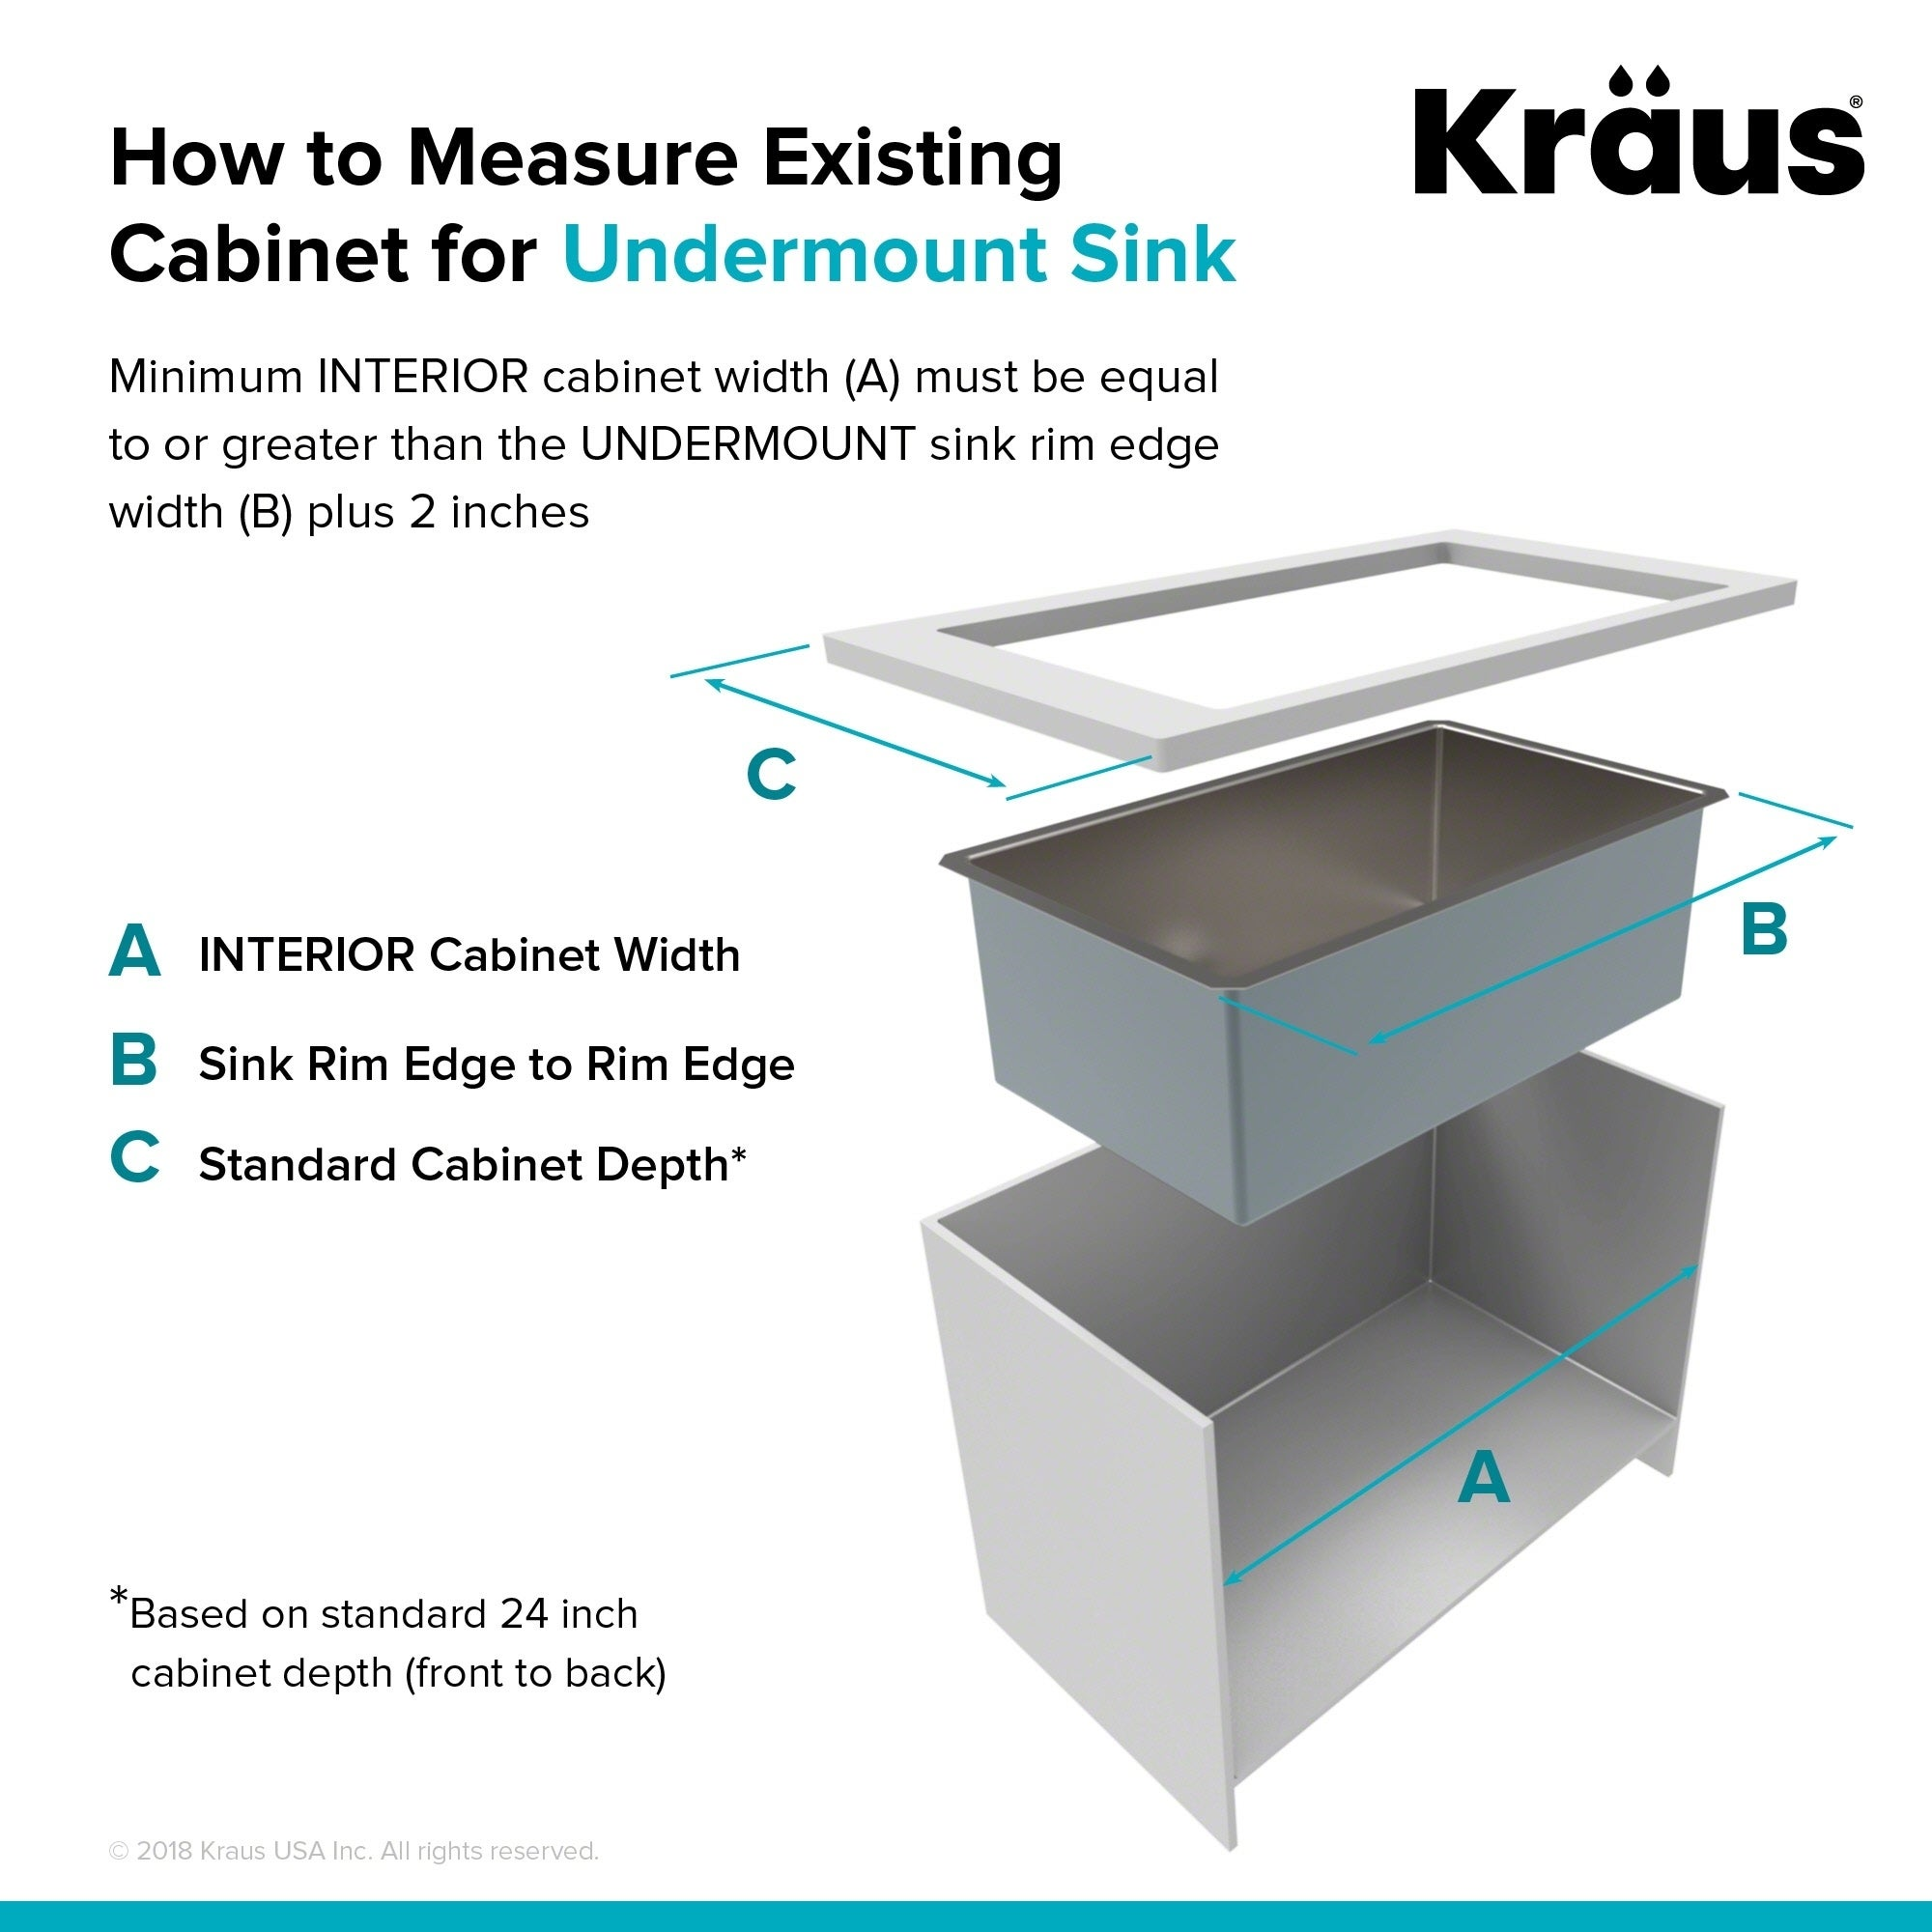 Kraus Khu101 23 Undermount In 16g 1 Bowl Satin Stainless Steel Kitchen Sink Grid Strainer Towel Free Shipping Today 3730988